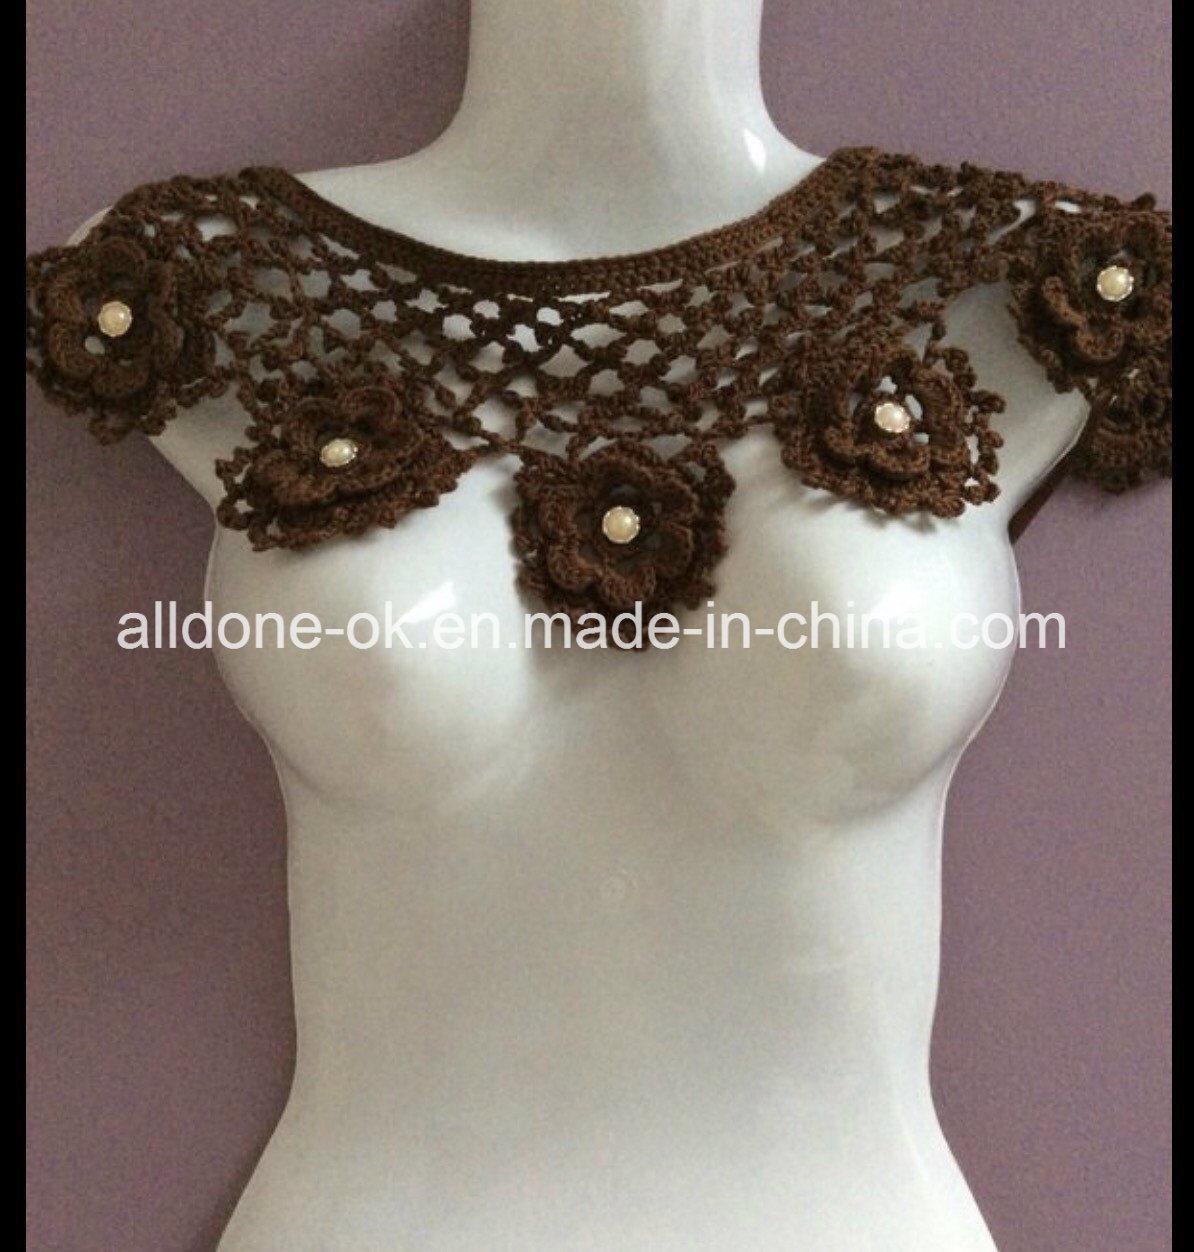 OEM Custom Hand Crochet Necklace Bib Lace Collar Garment Accessories